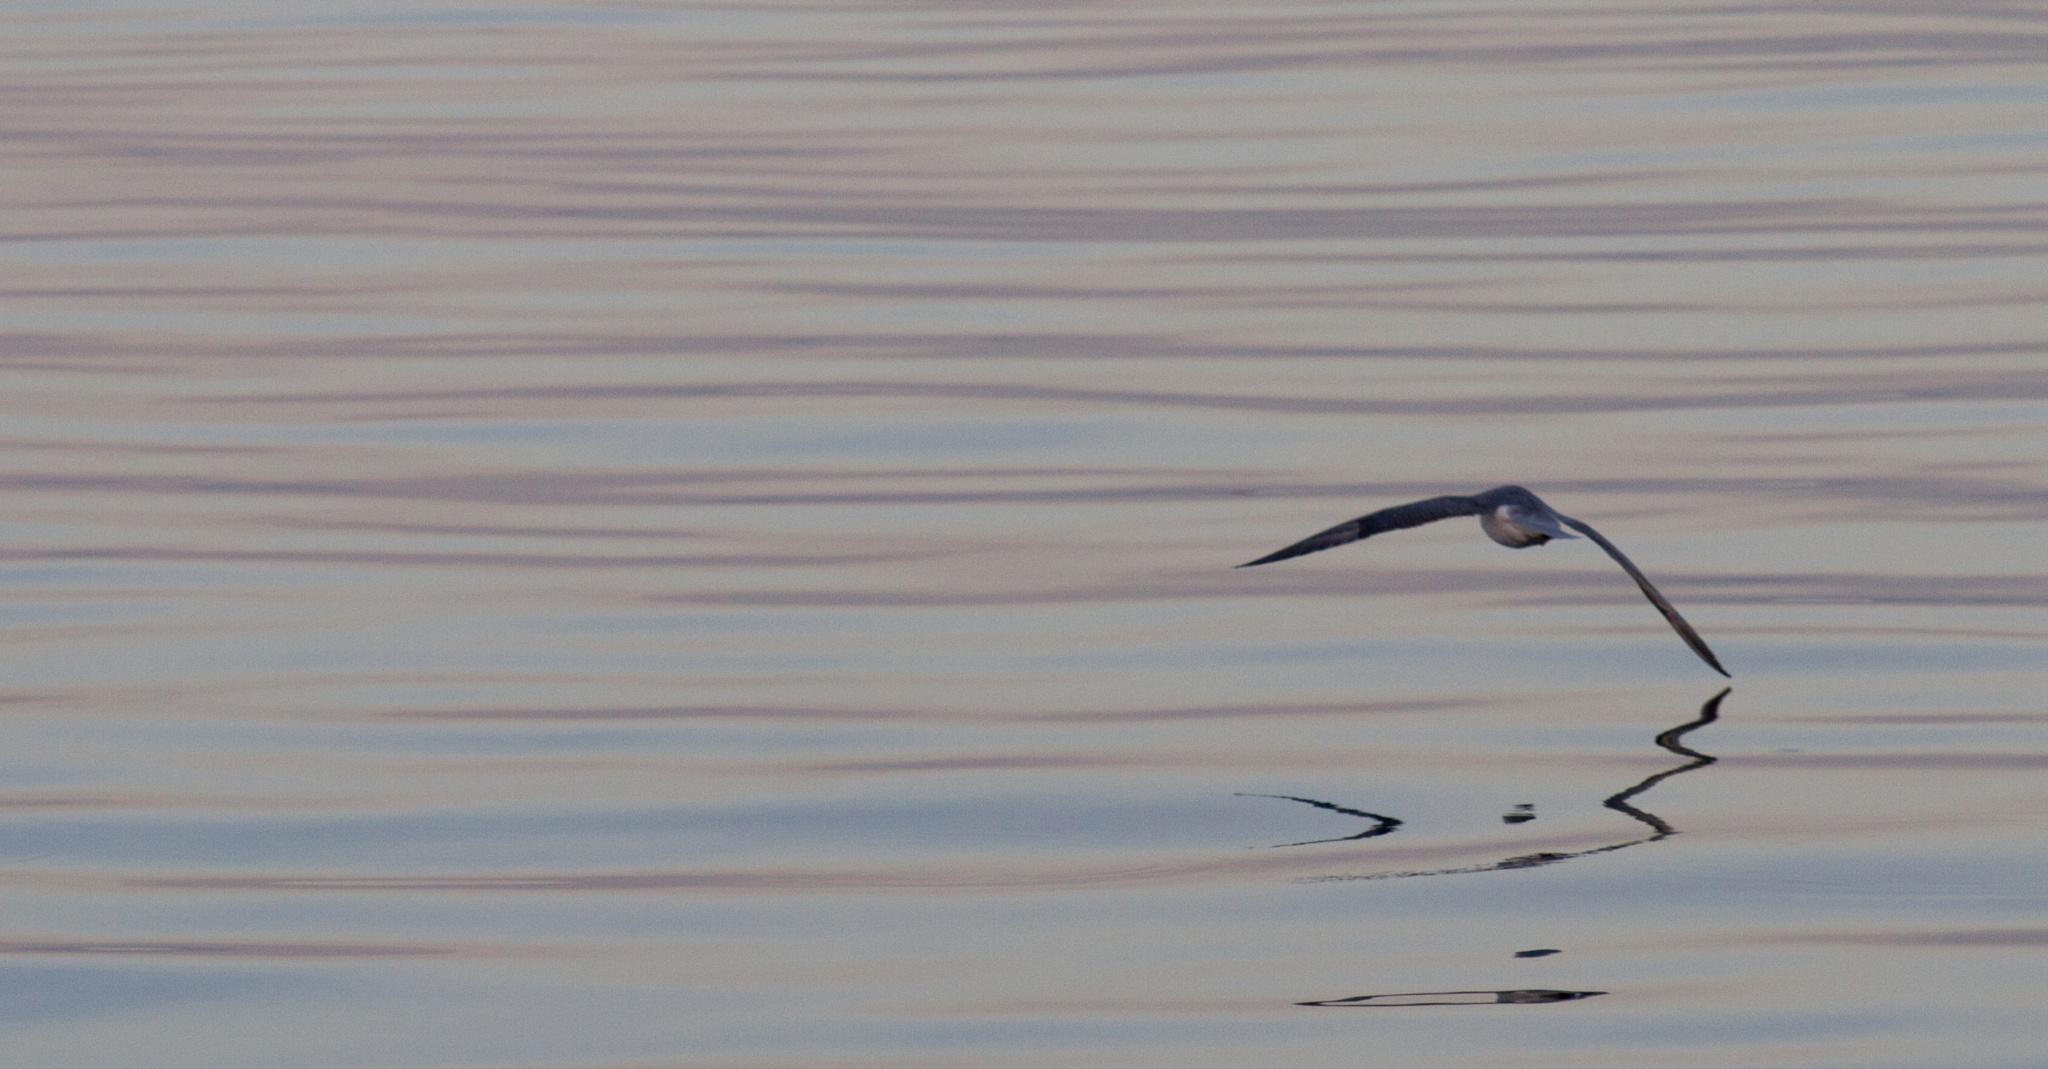 fulmar over calm sea by Gordon Dryden